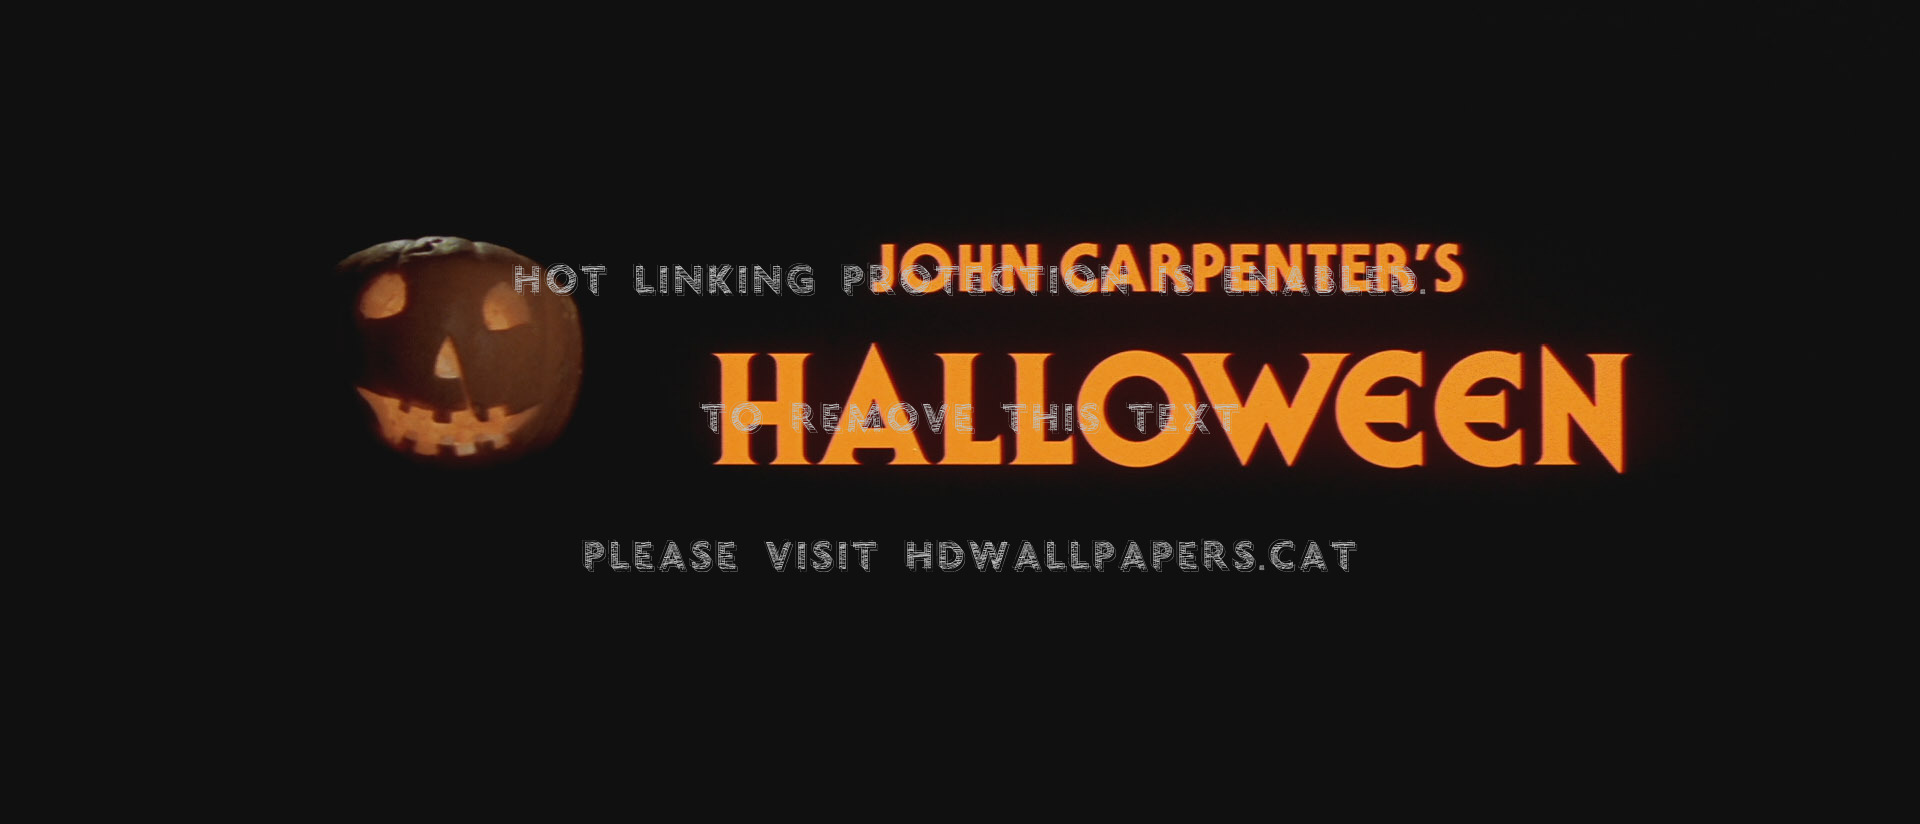 Halloween 1978 Wallpaper.John Carpenter Halloween Michael Myers Halloween 1978 1920x824 Wallpaper Teahub Io